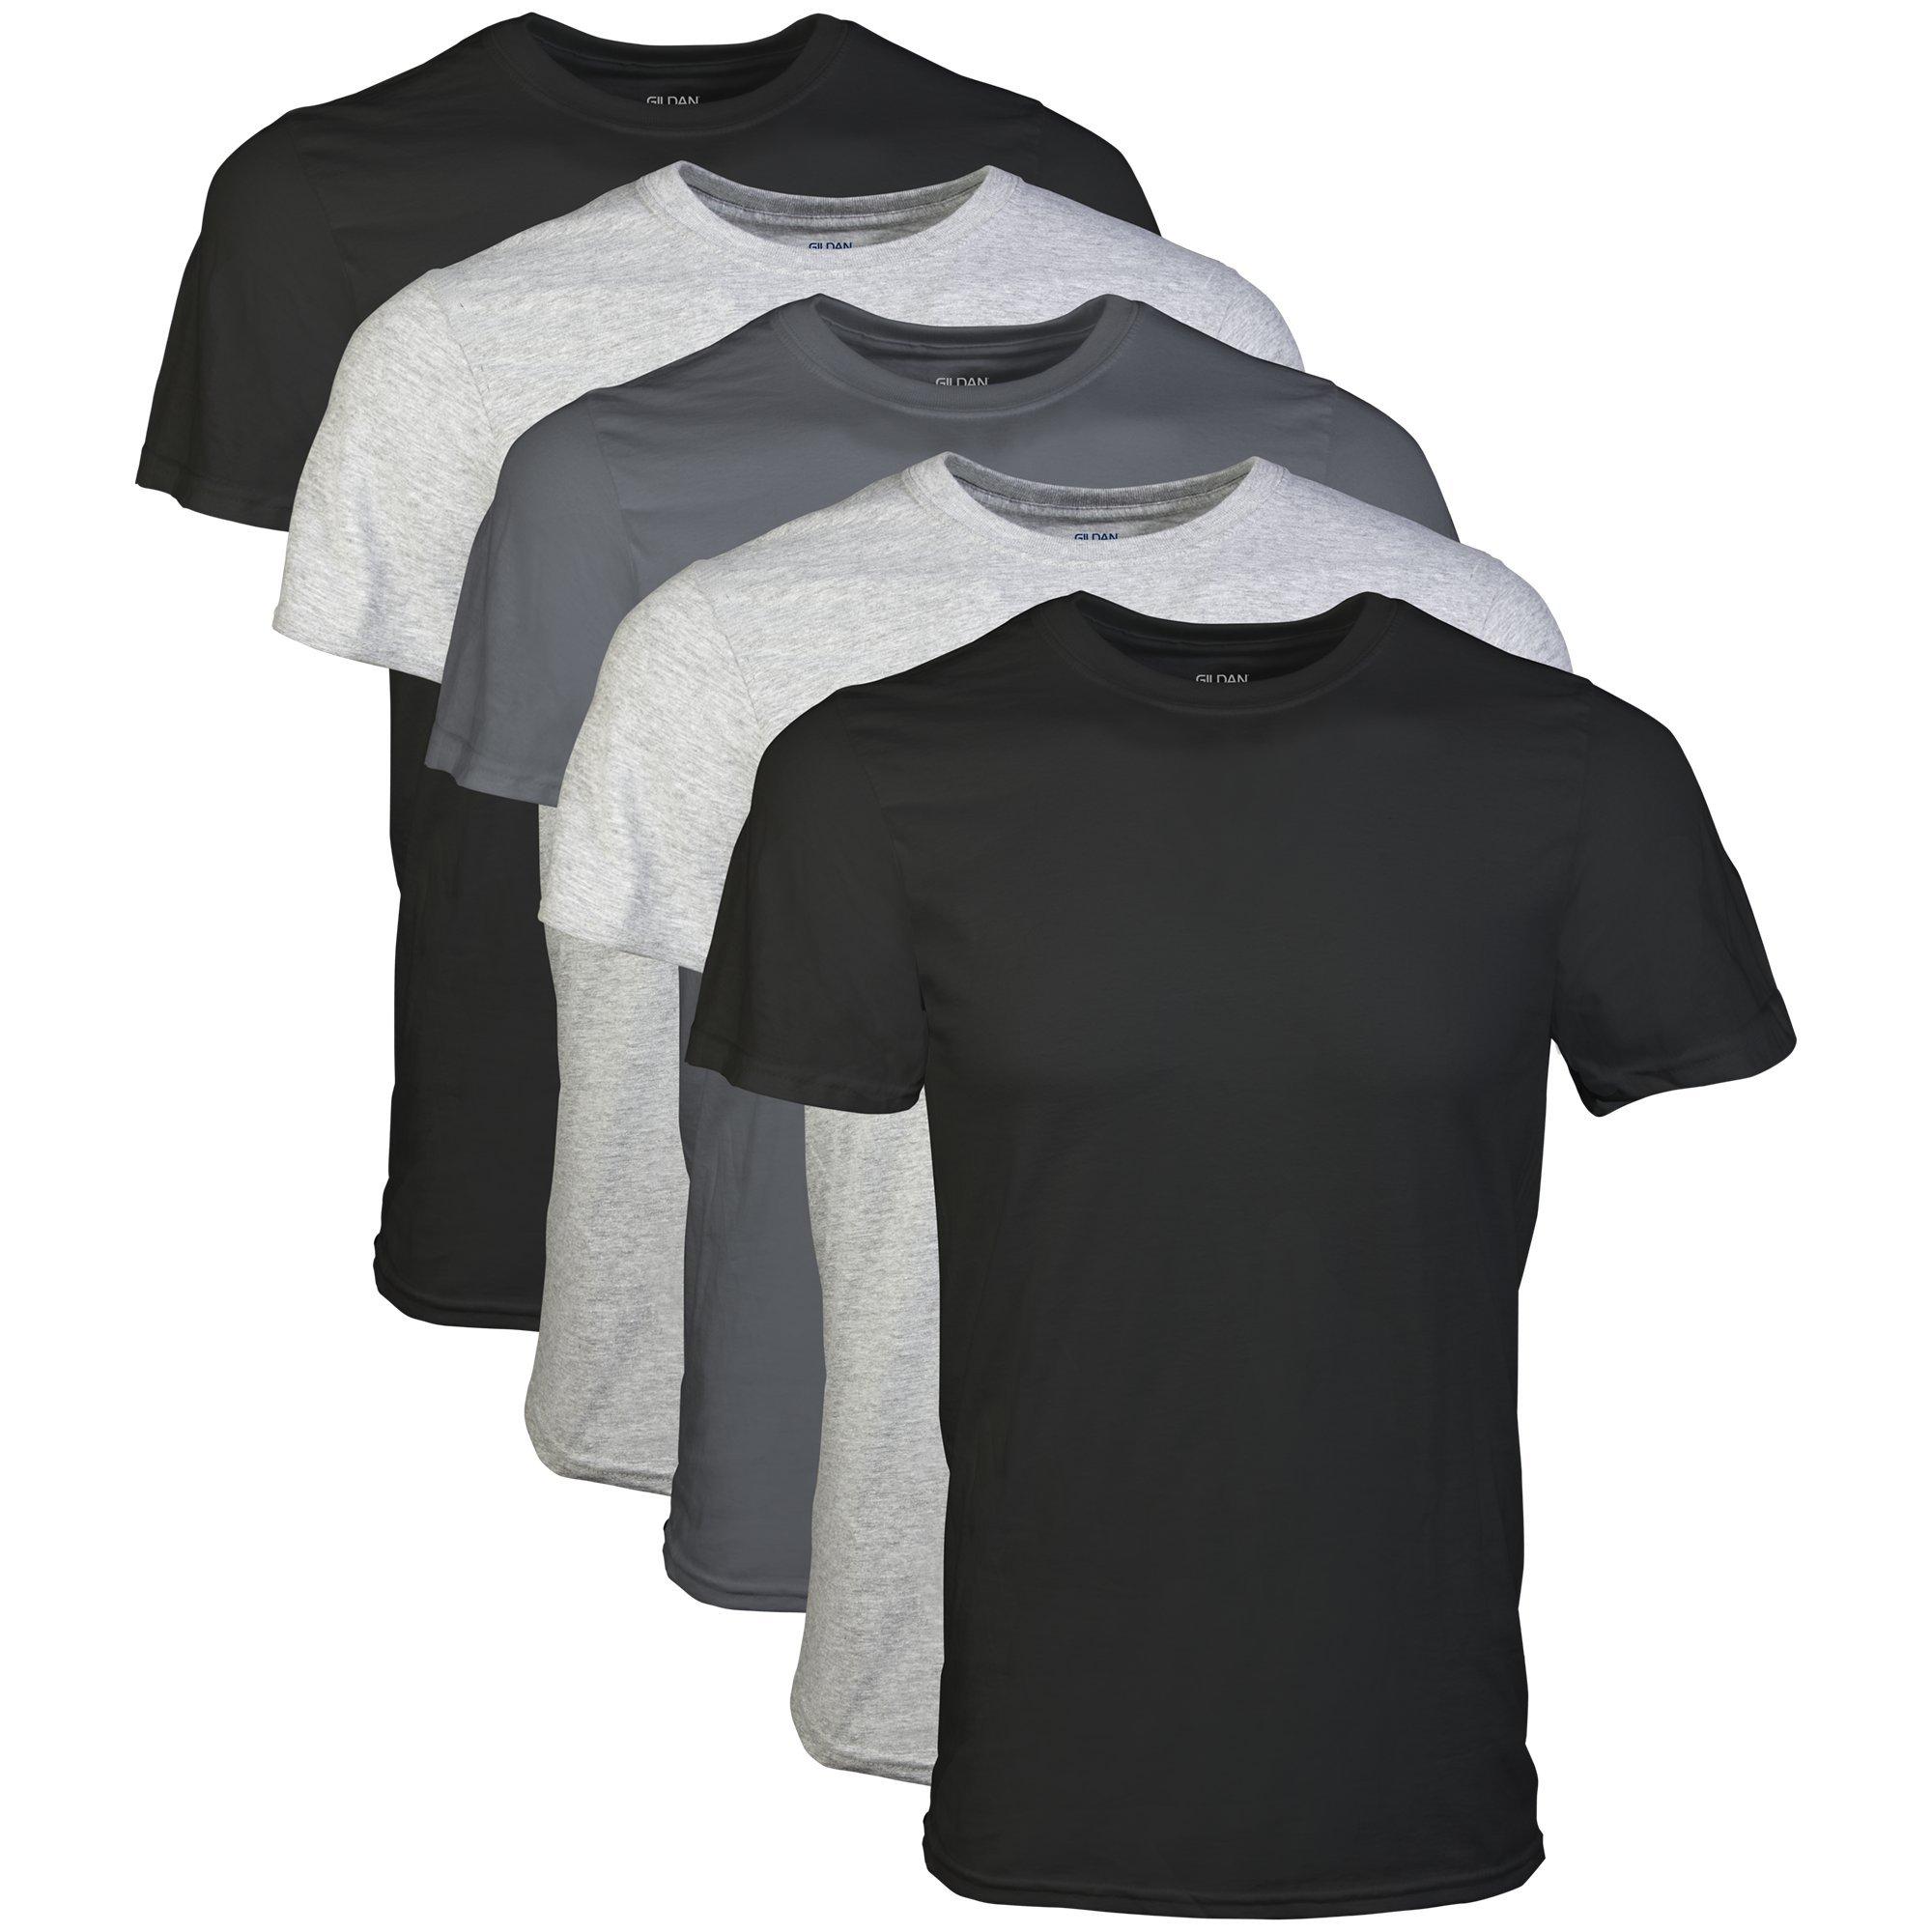 Gildan Men's Crew T-Shirt Multipack, Assorted 2XL (5 Pack), 2X-Large by Gildan